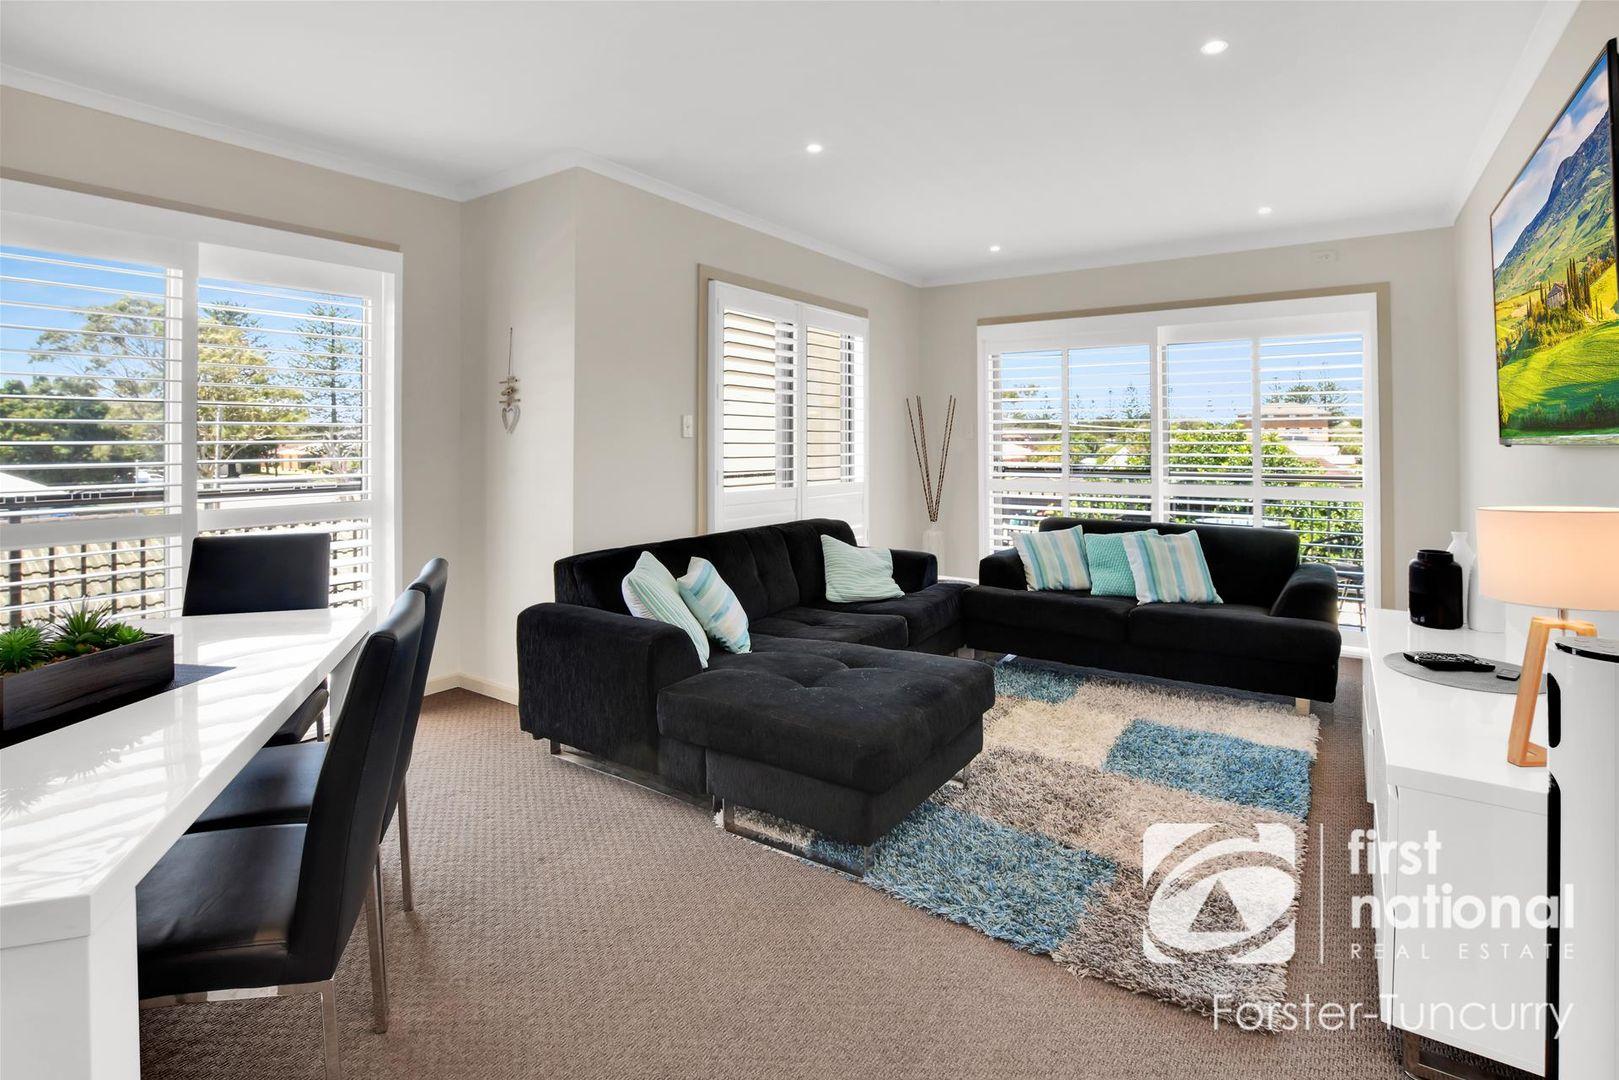 11/60-62 Wharf Street, Tuncurry NSW 2428, Image 0